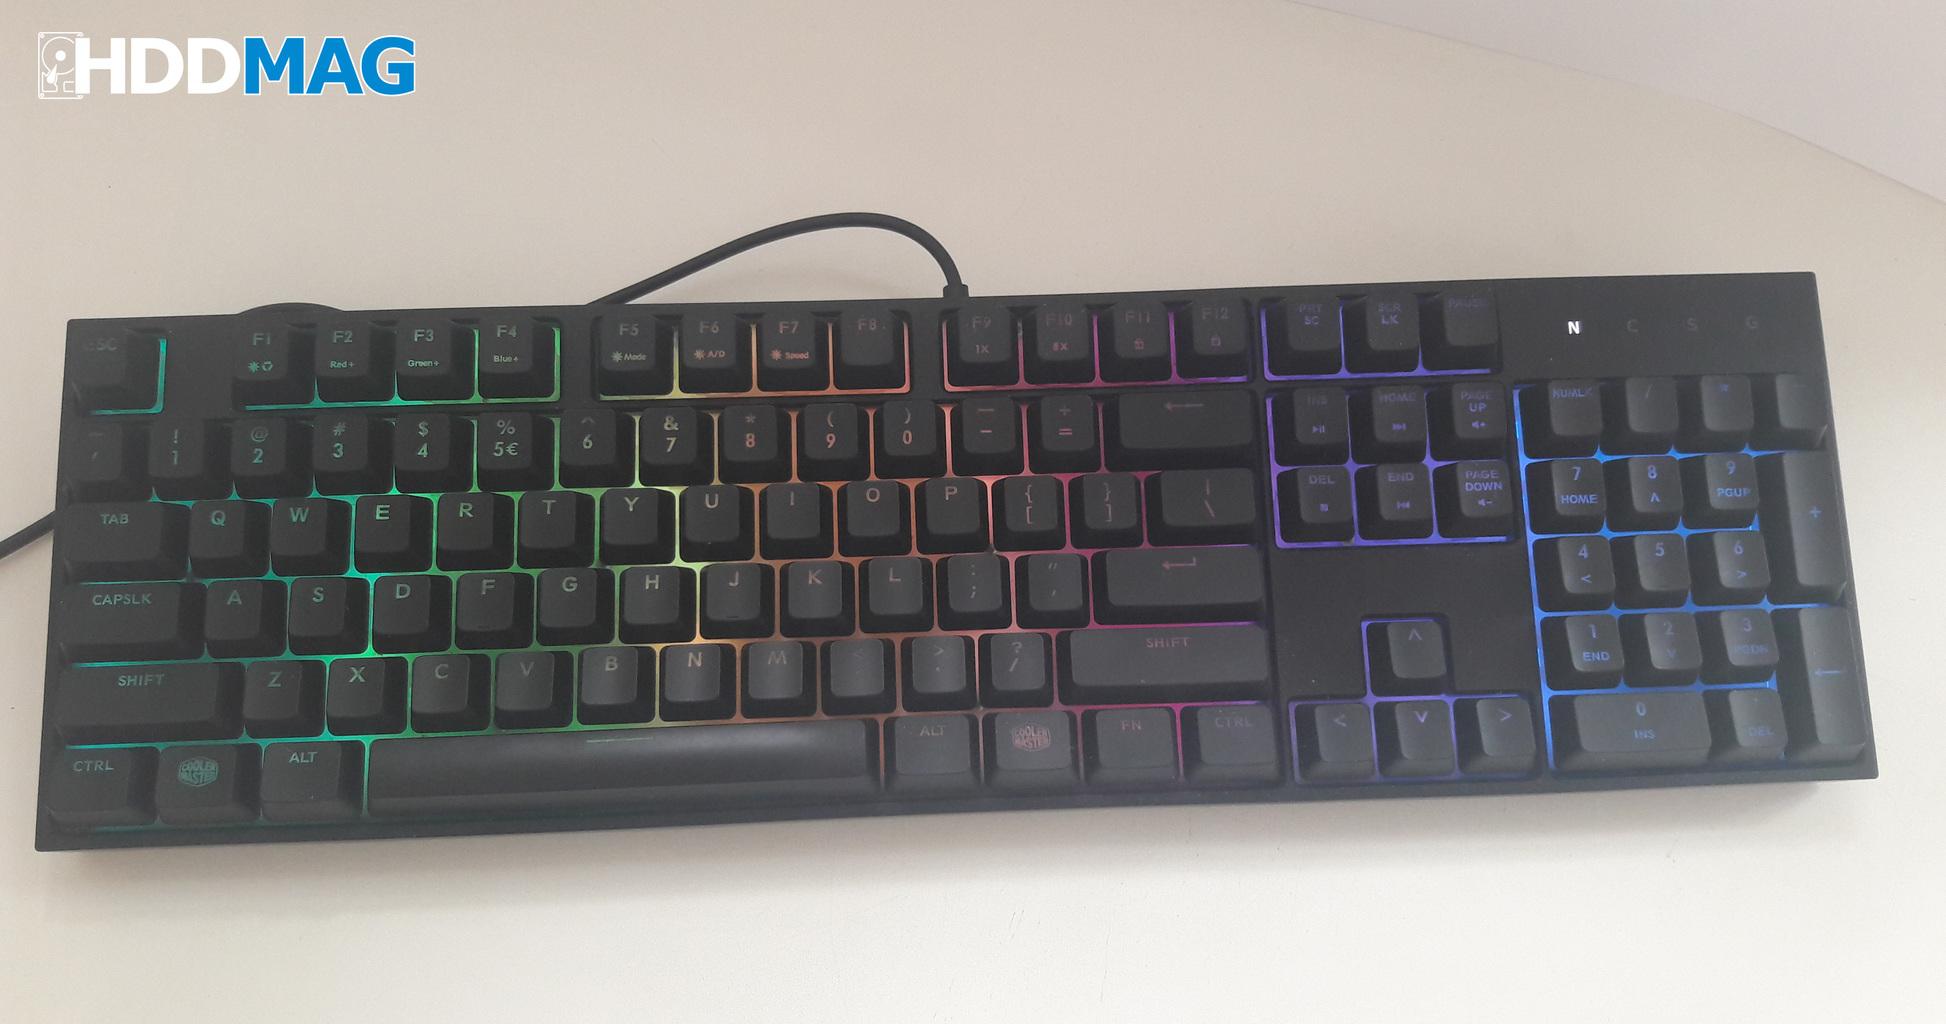 Cooler master keyboard